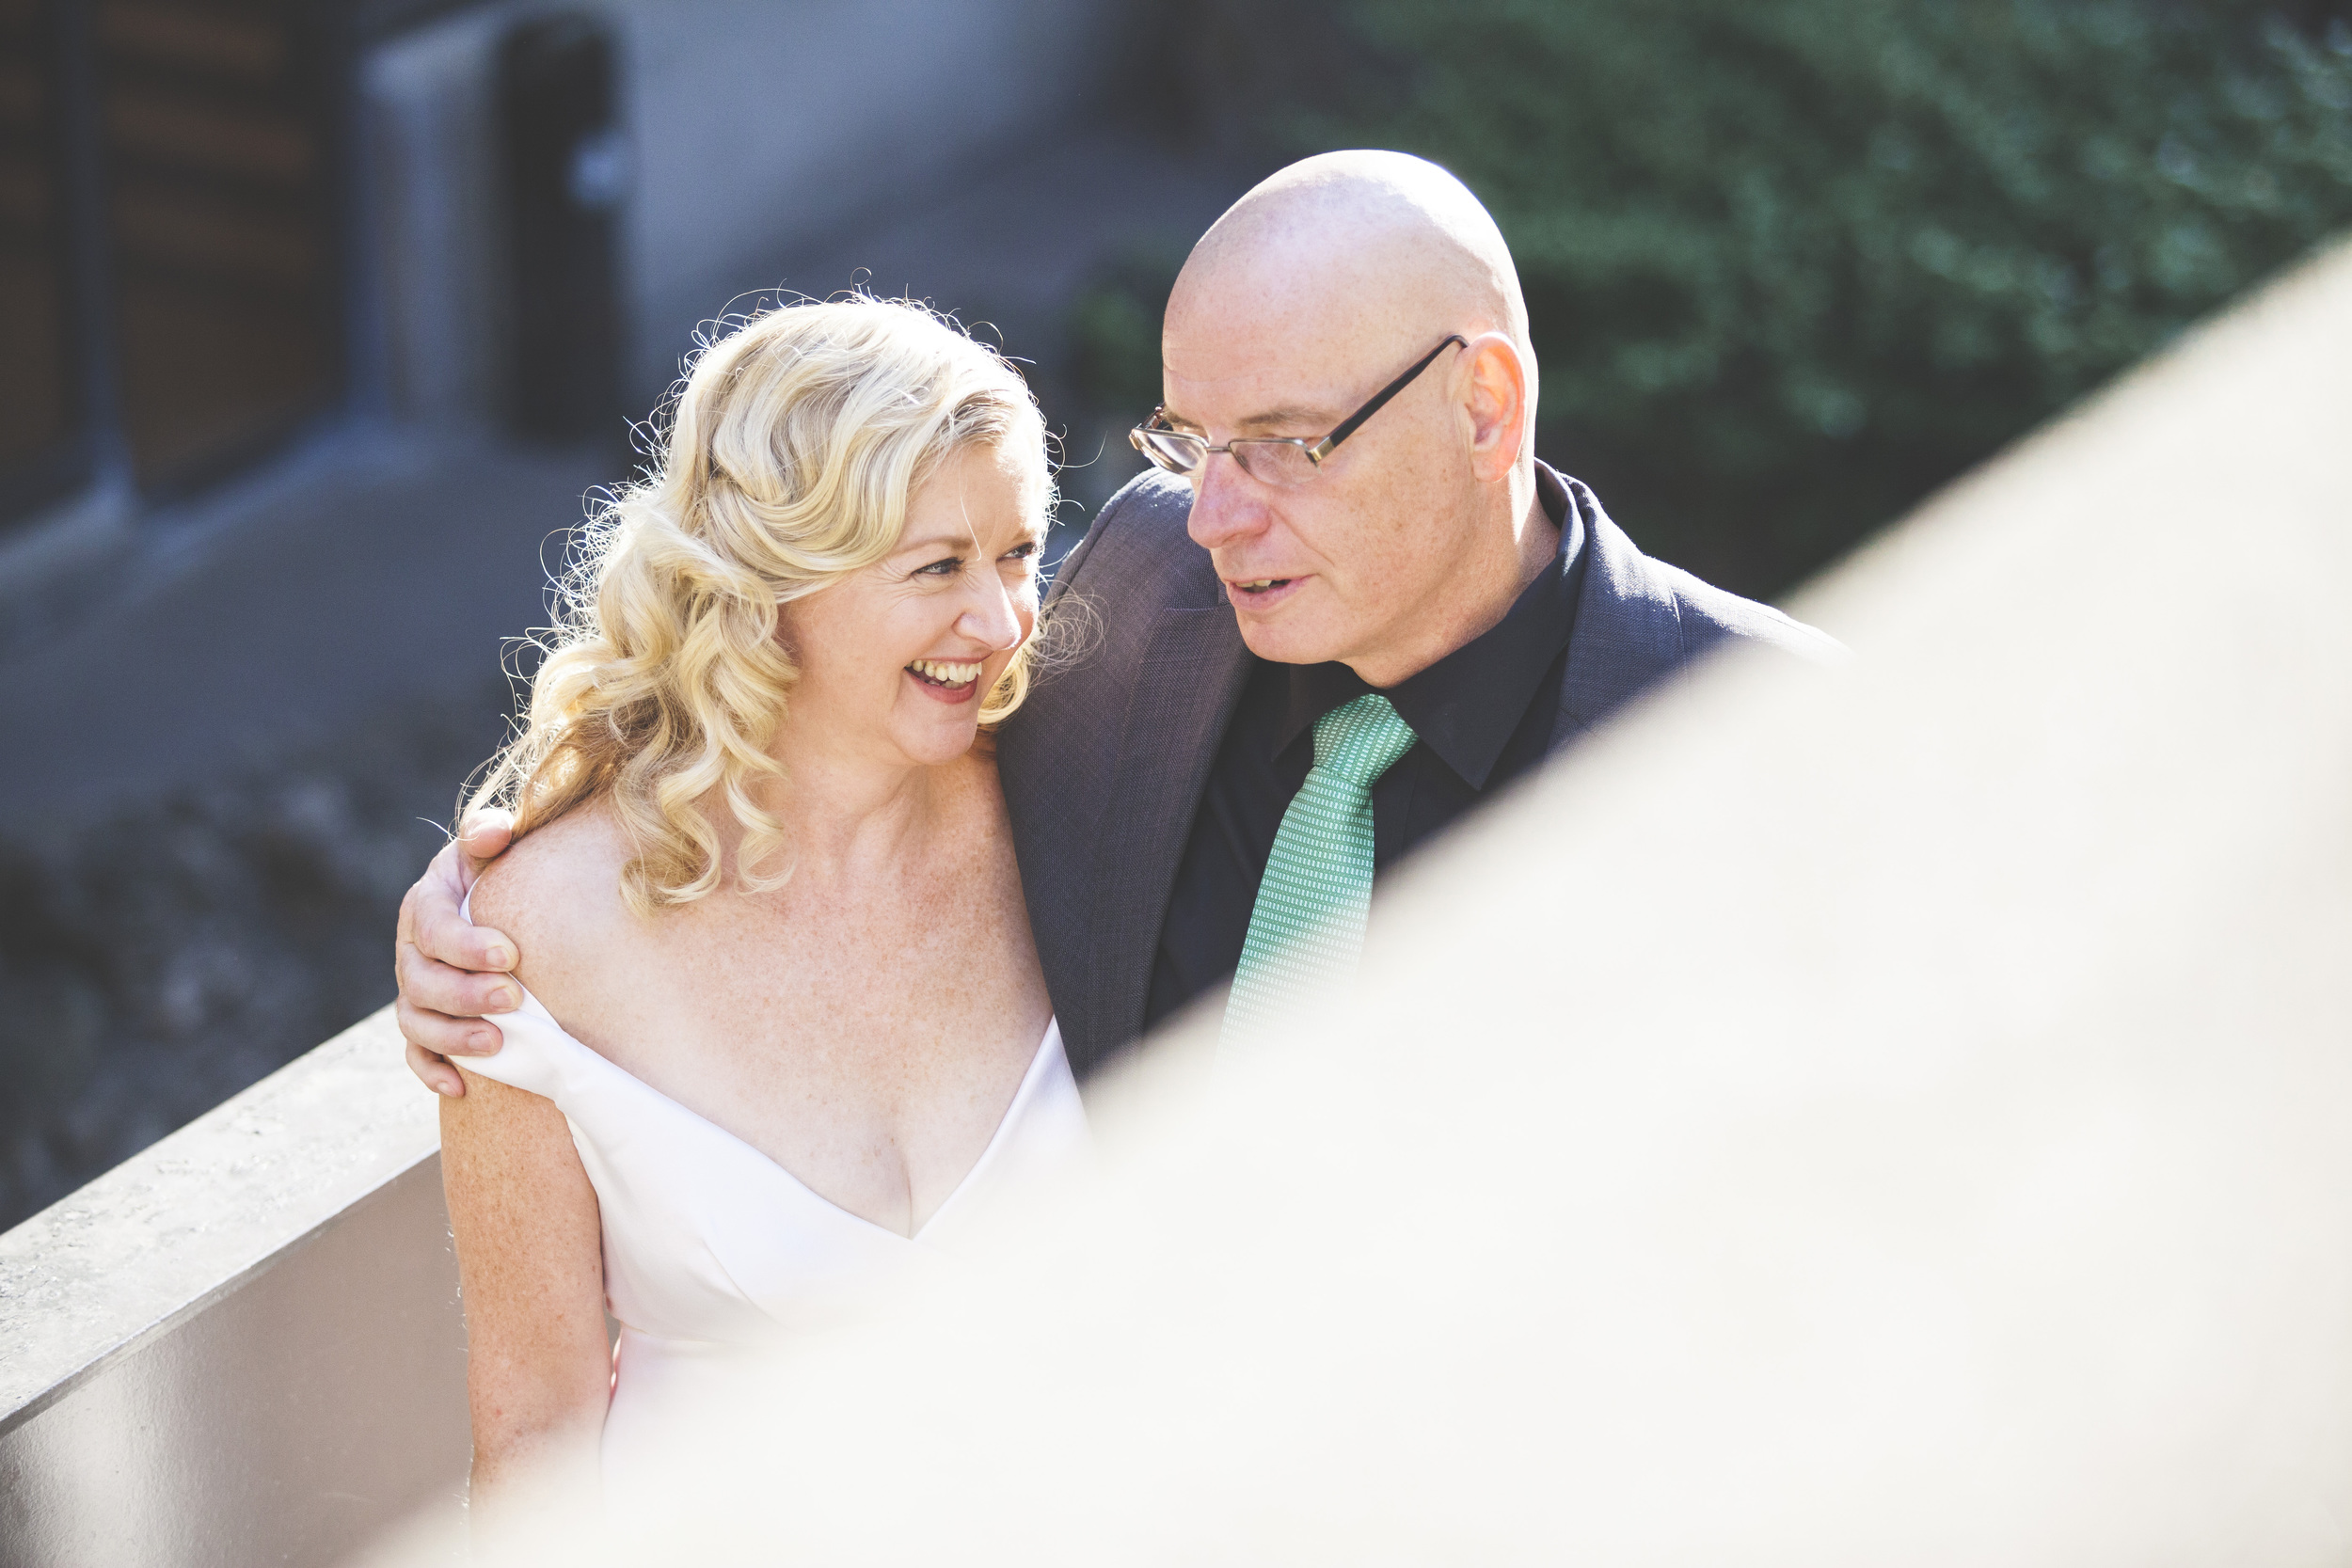 Wedding photos at the Sheraton hotel in Toronto.